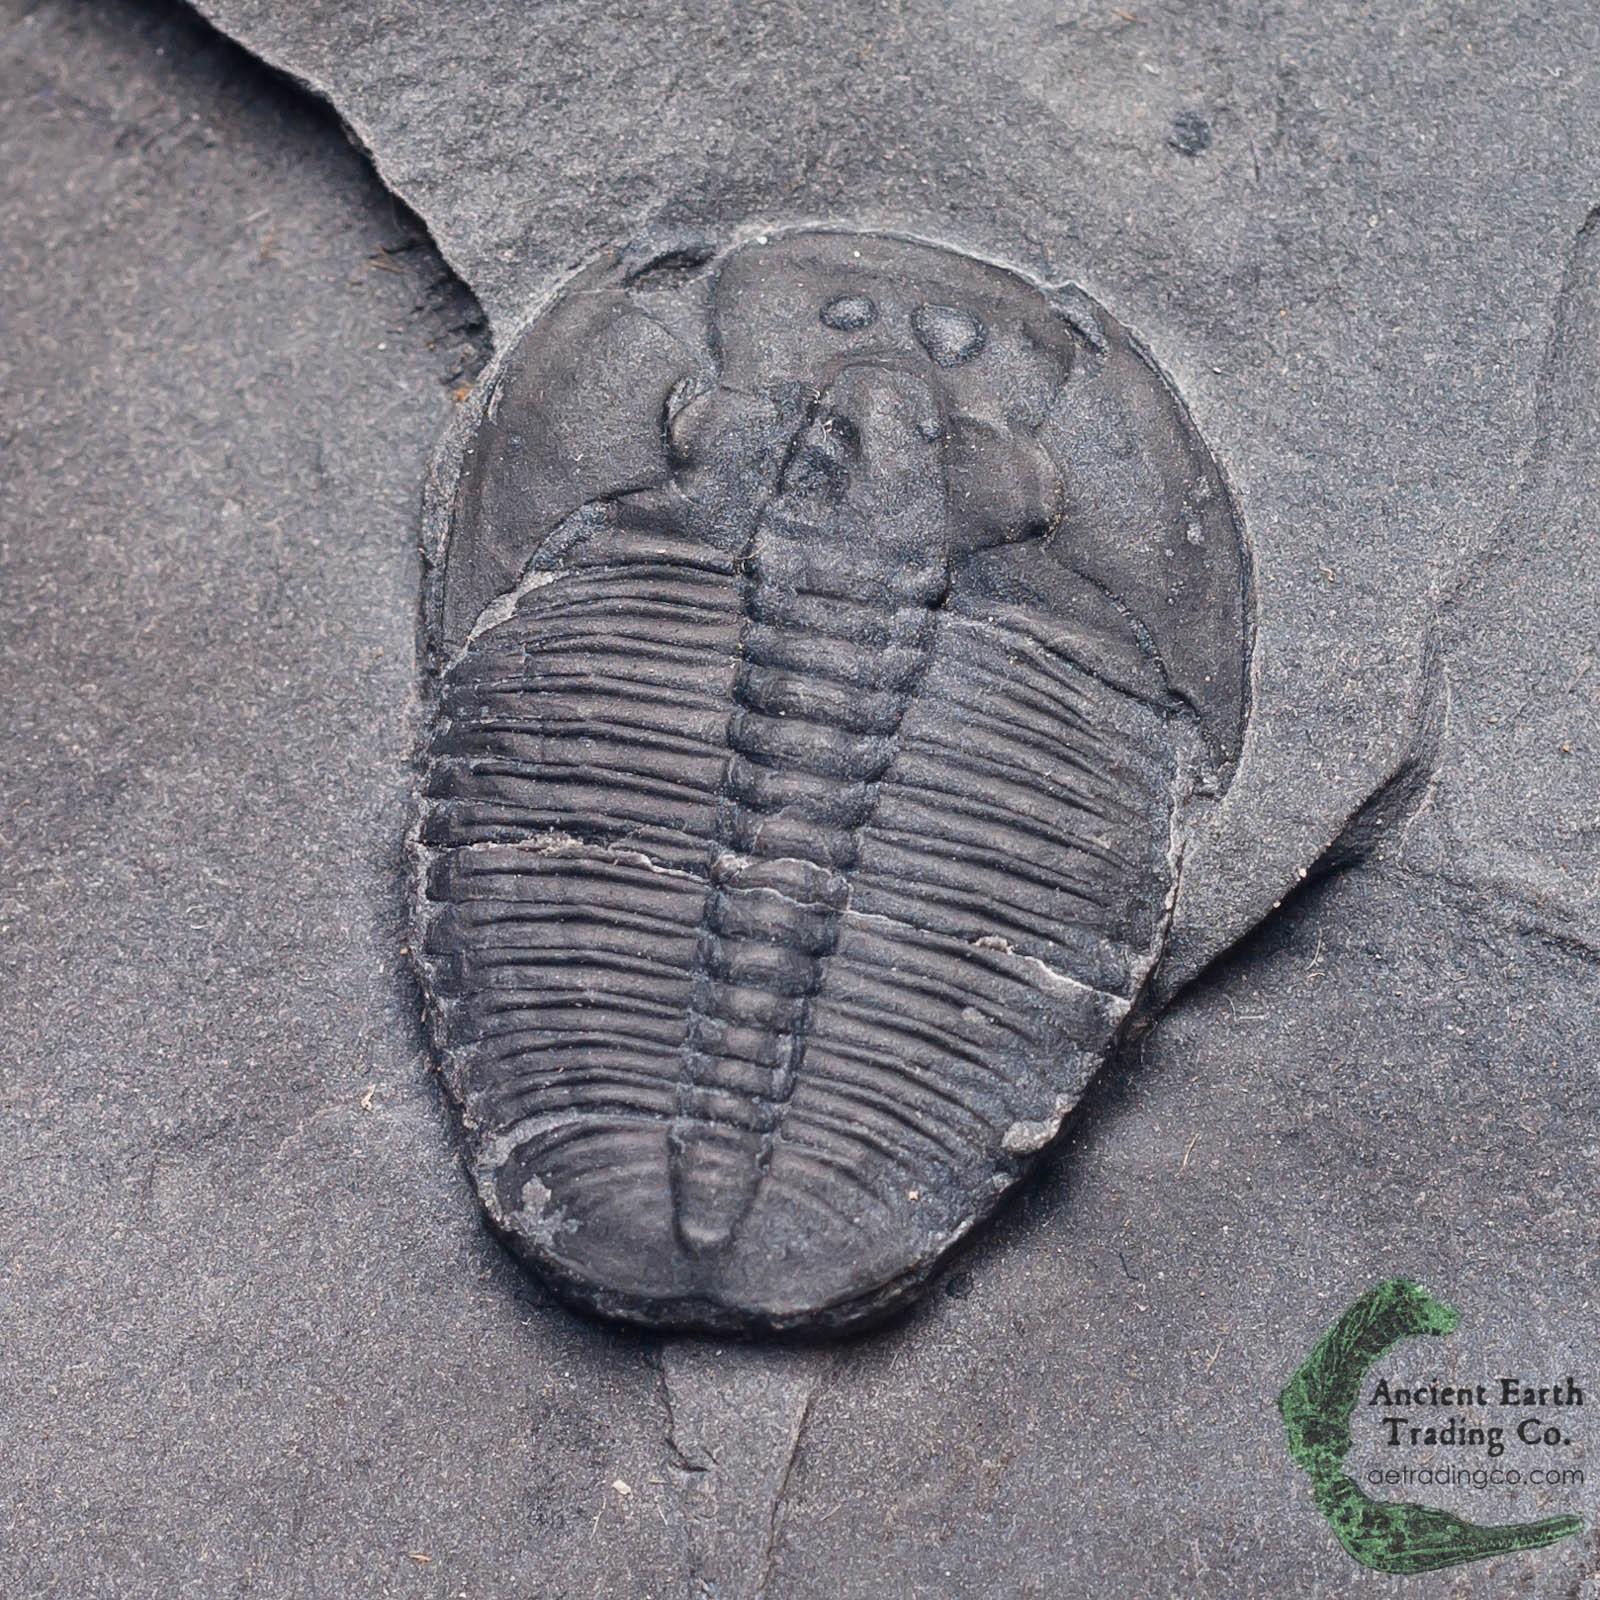 Elrathia kingii Trilobite Fossil